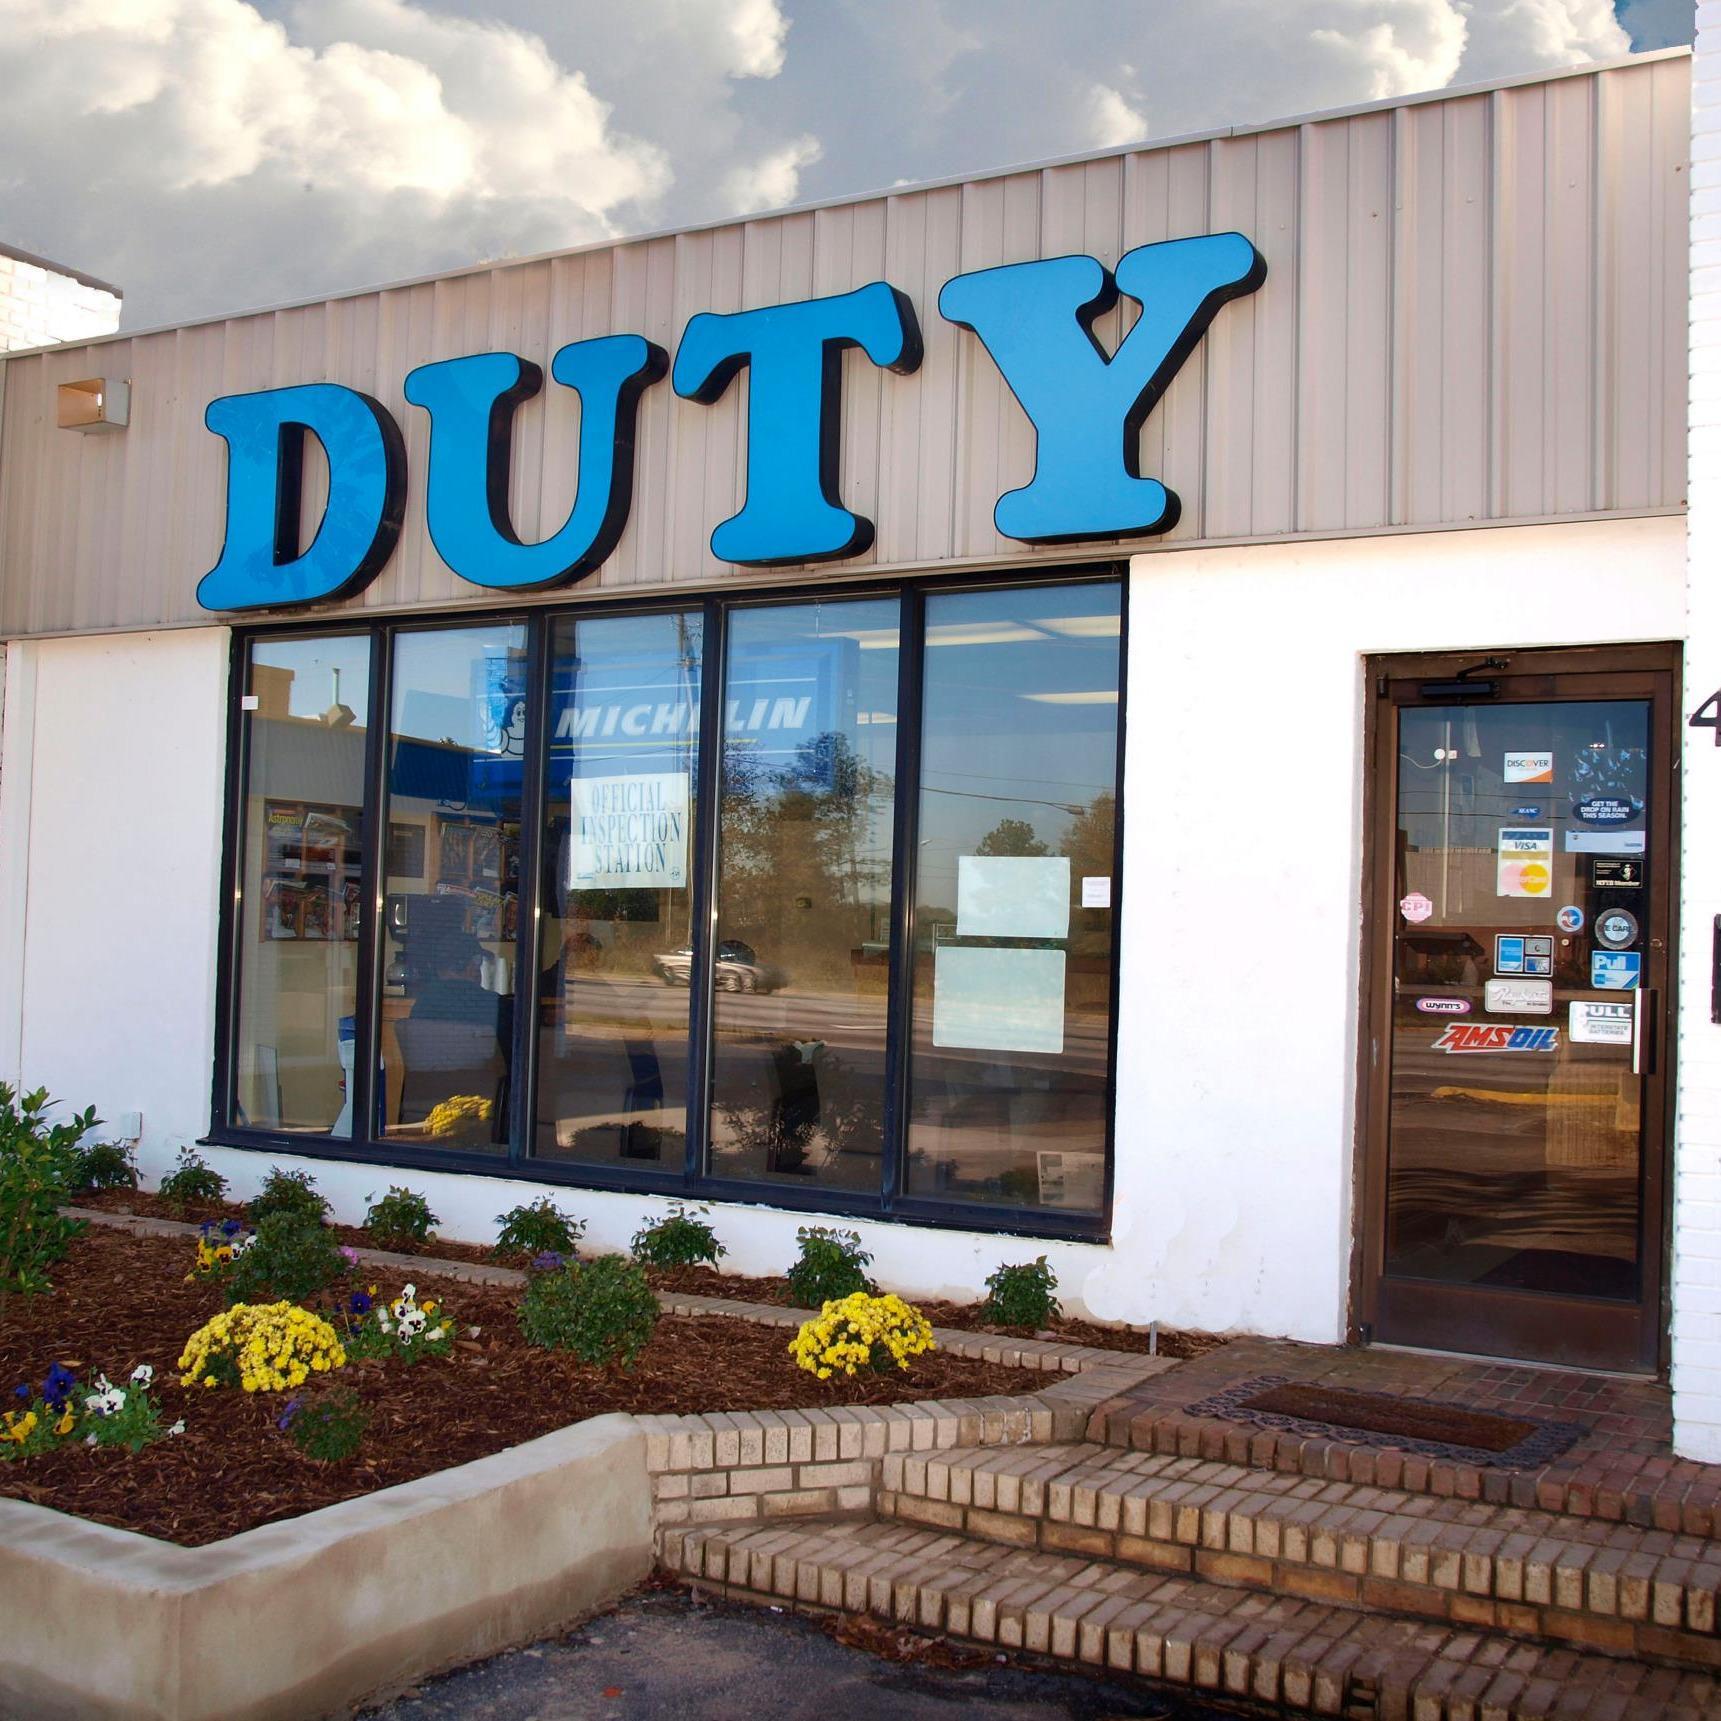 Duty Tire & Service Center - Raleigh, NC - General Auto Repair & Service